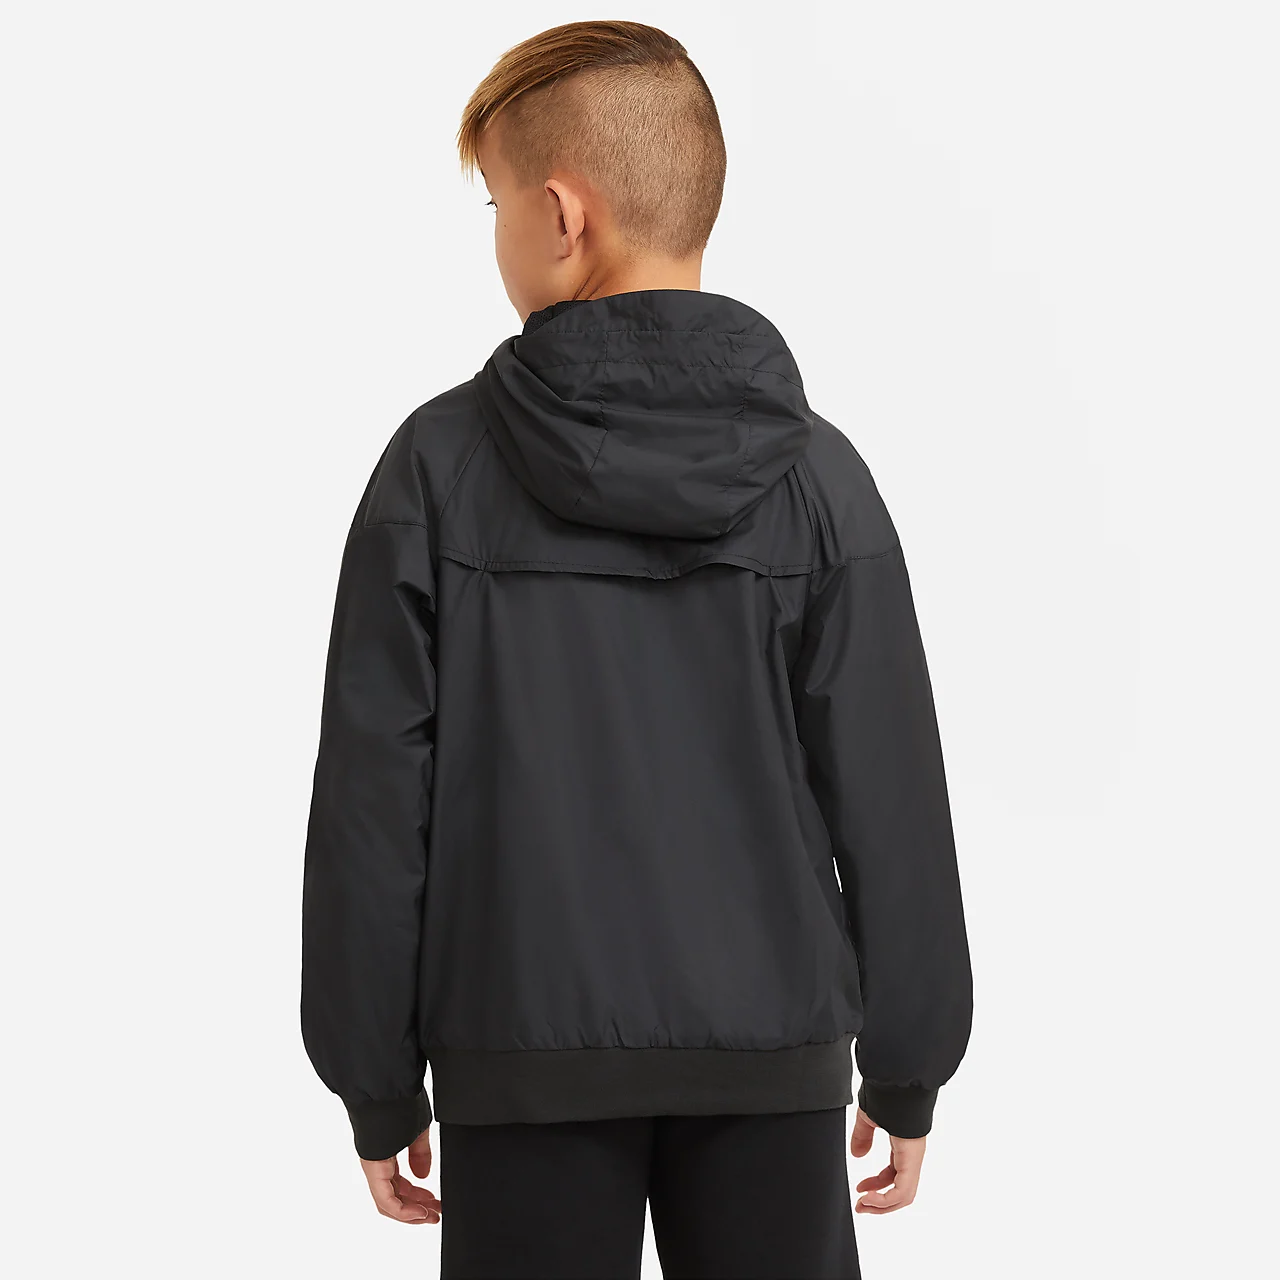 Nike Sportswear Windrunner Big Kids' (Boys') Hooded Jacket AQ8316-010